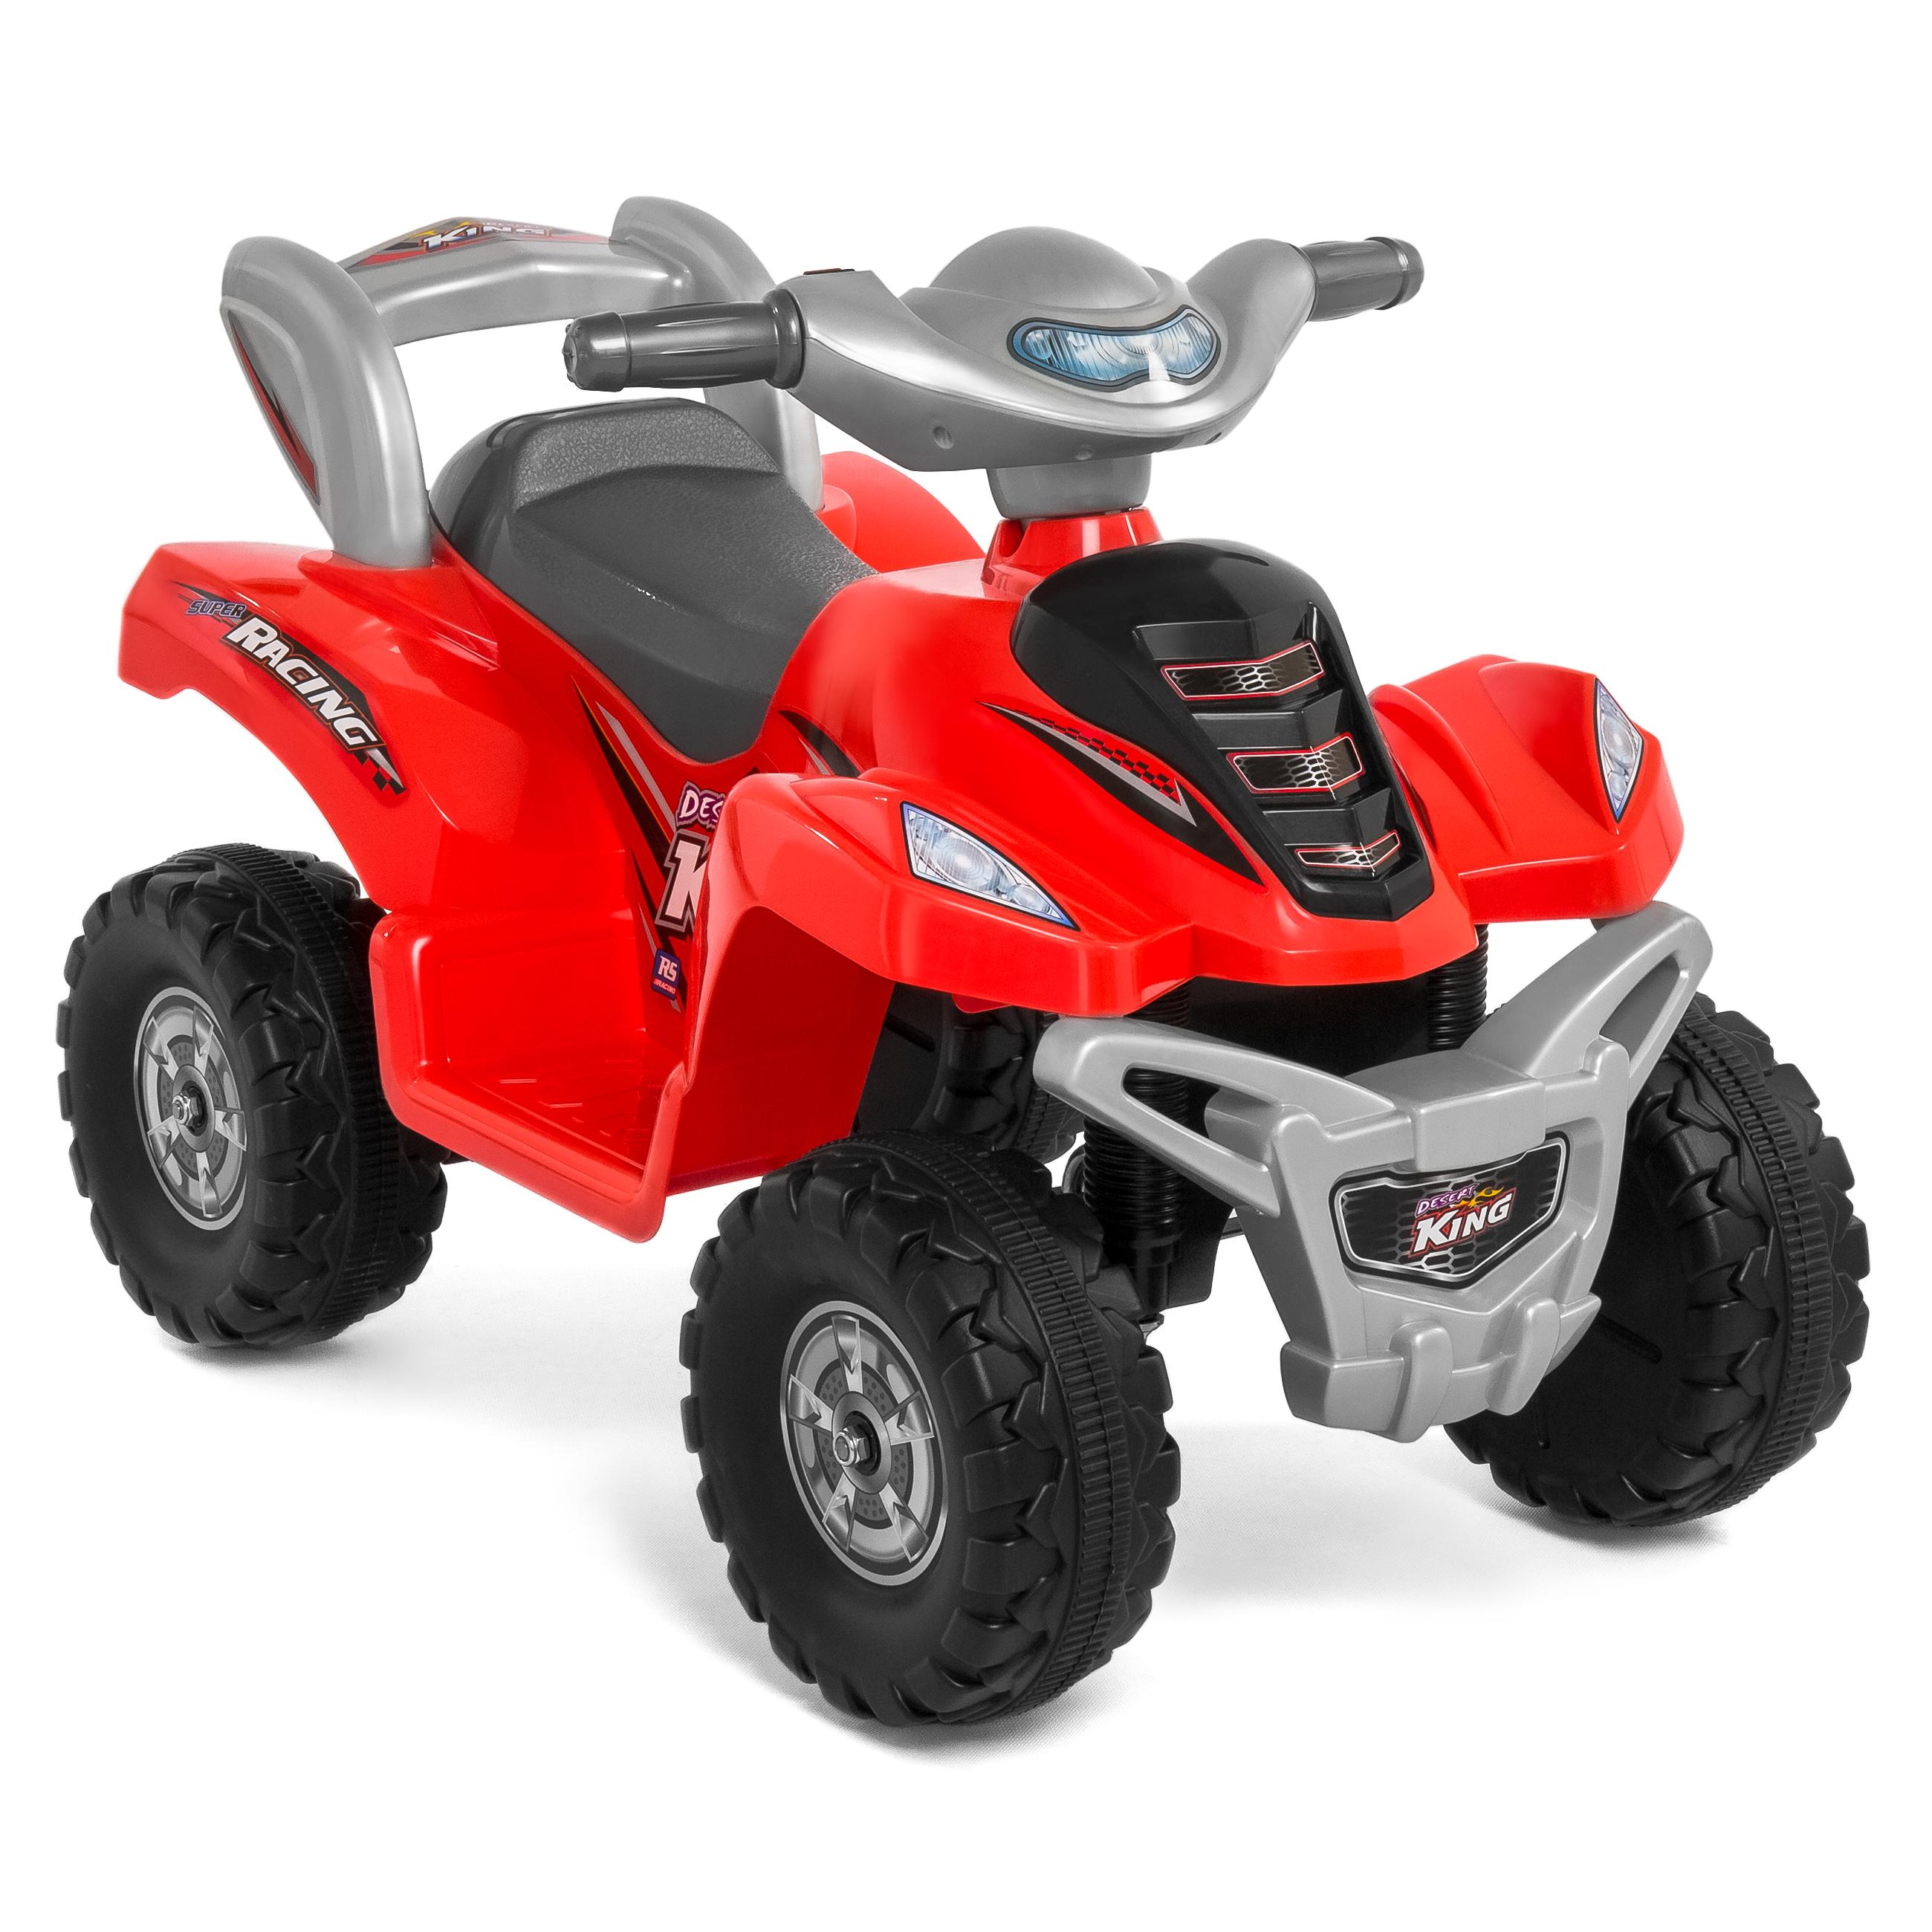 Kids ride on atv 6v toy quad battery power electric 4 Motorized kids toys